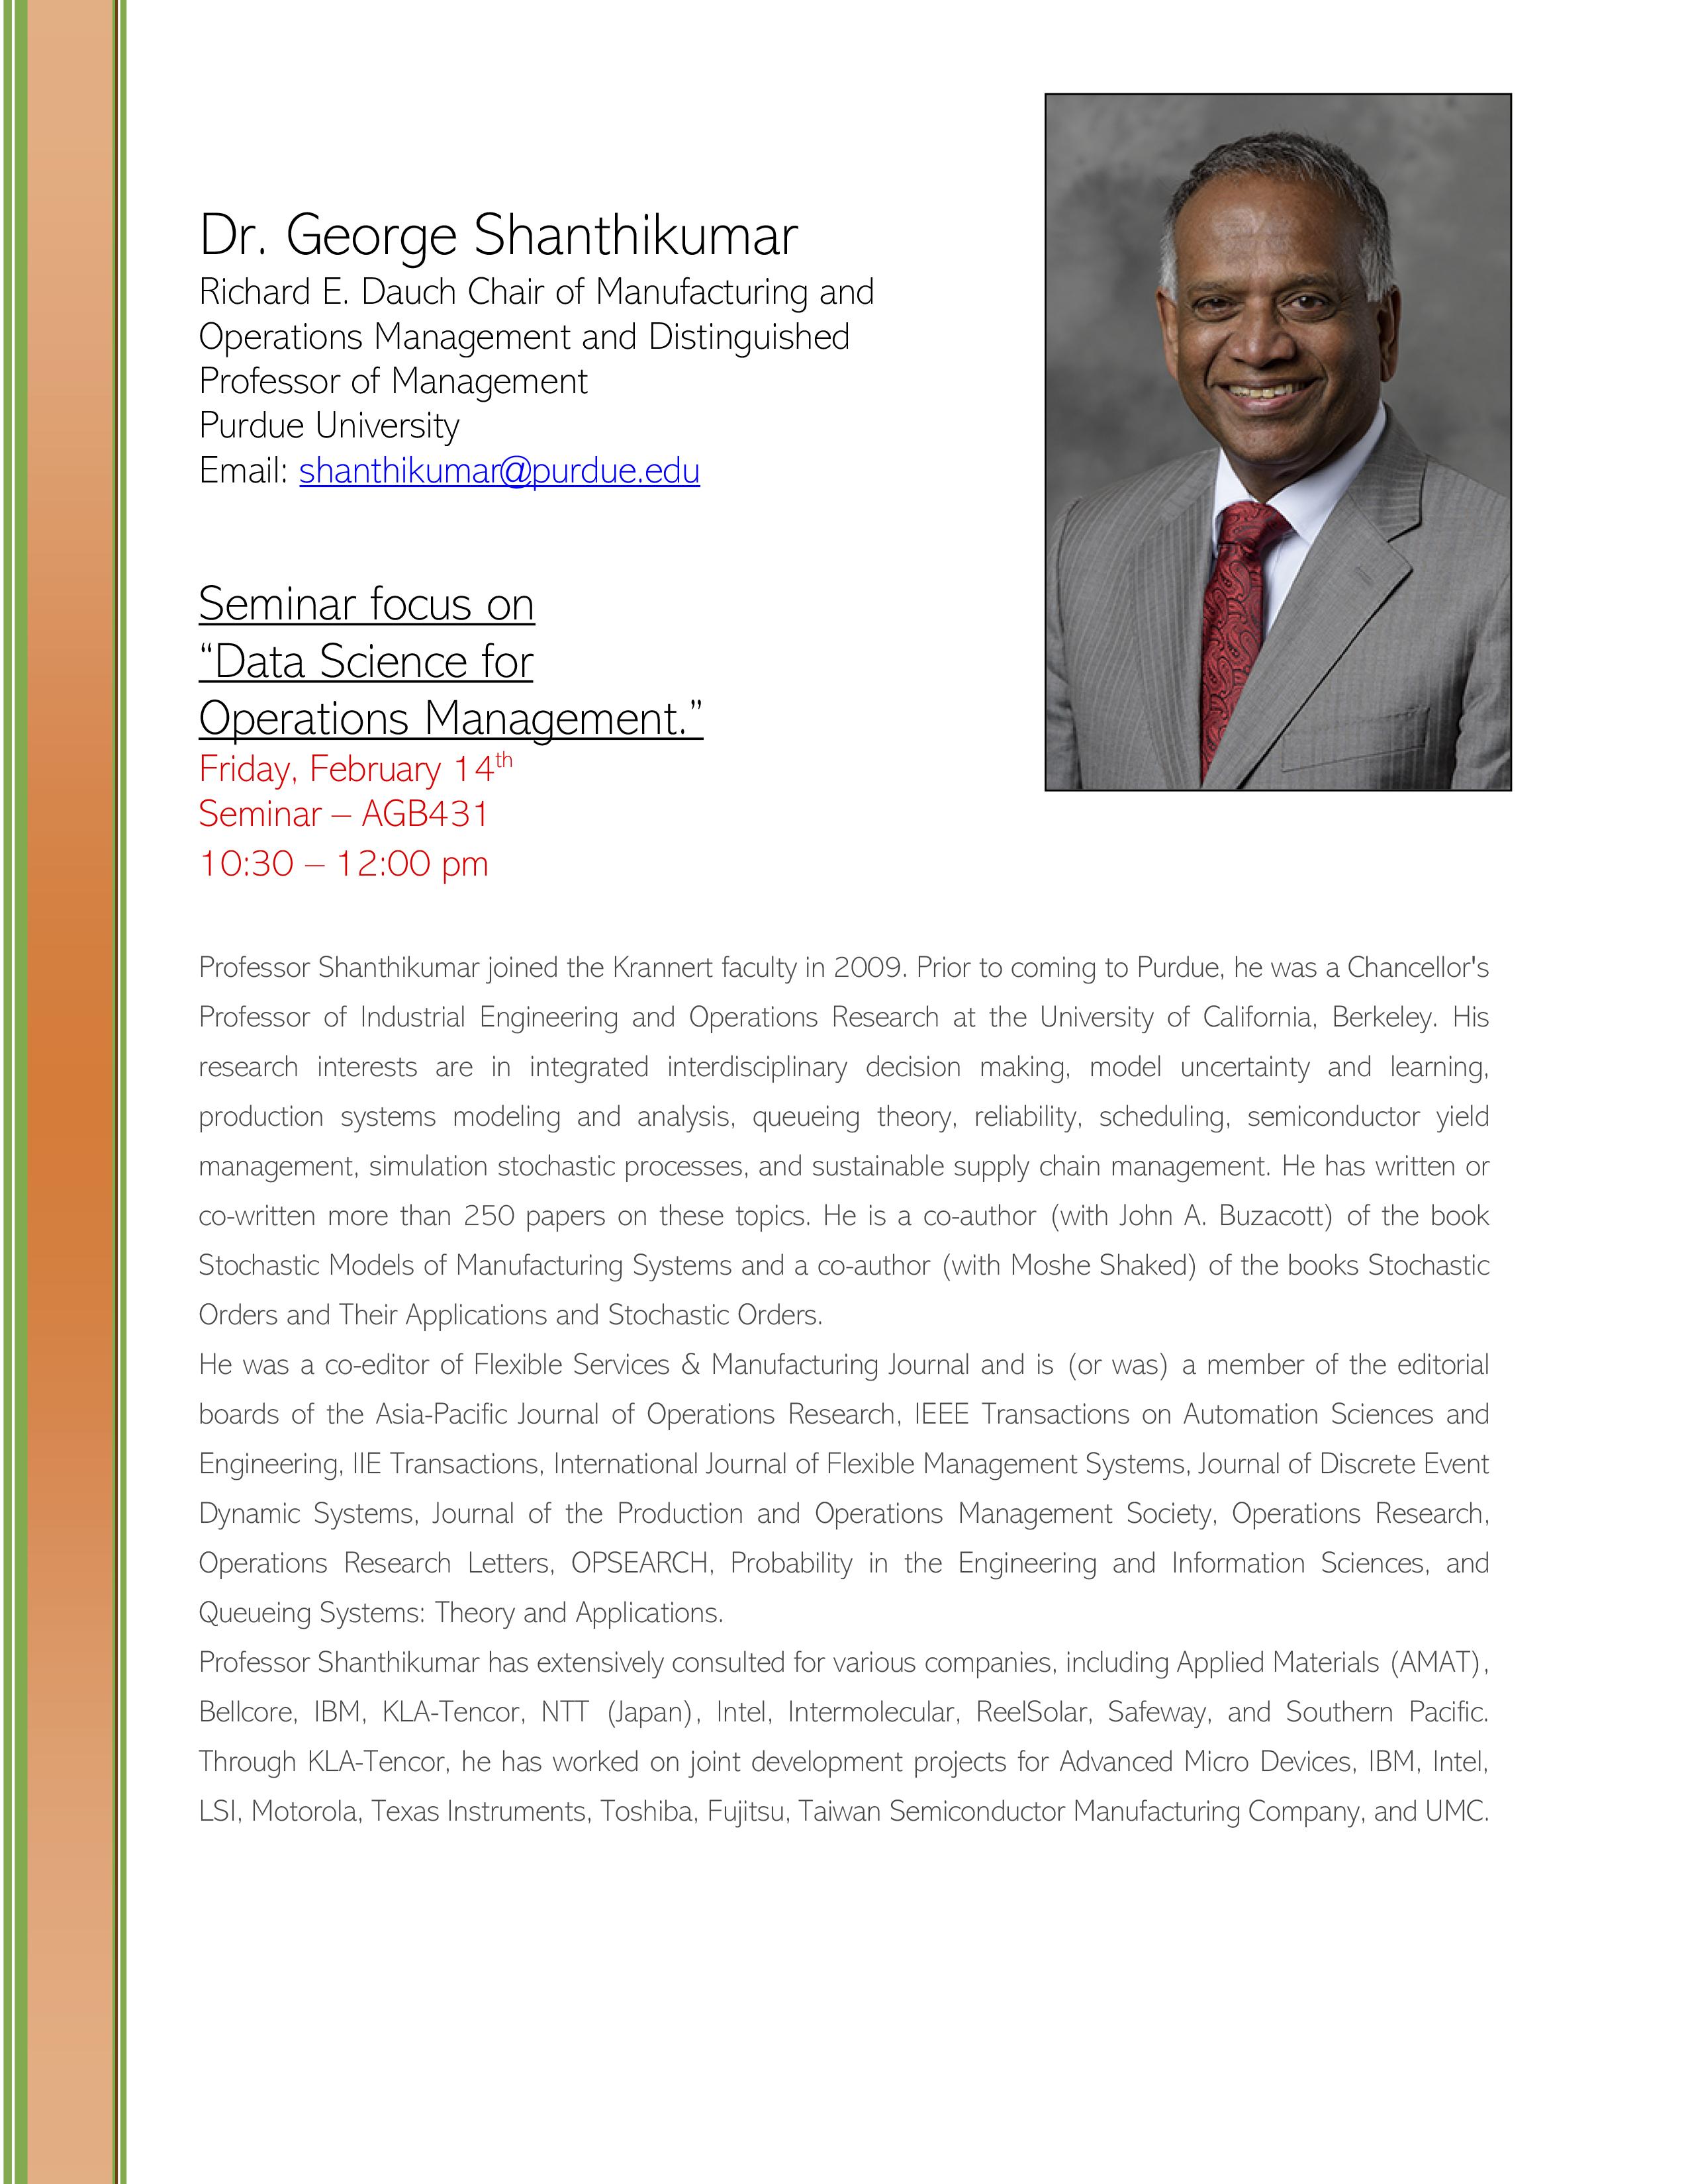 Dr. George Shanthikumar lecture FLYER